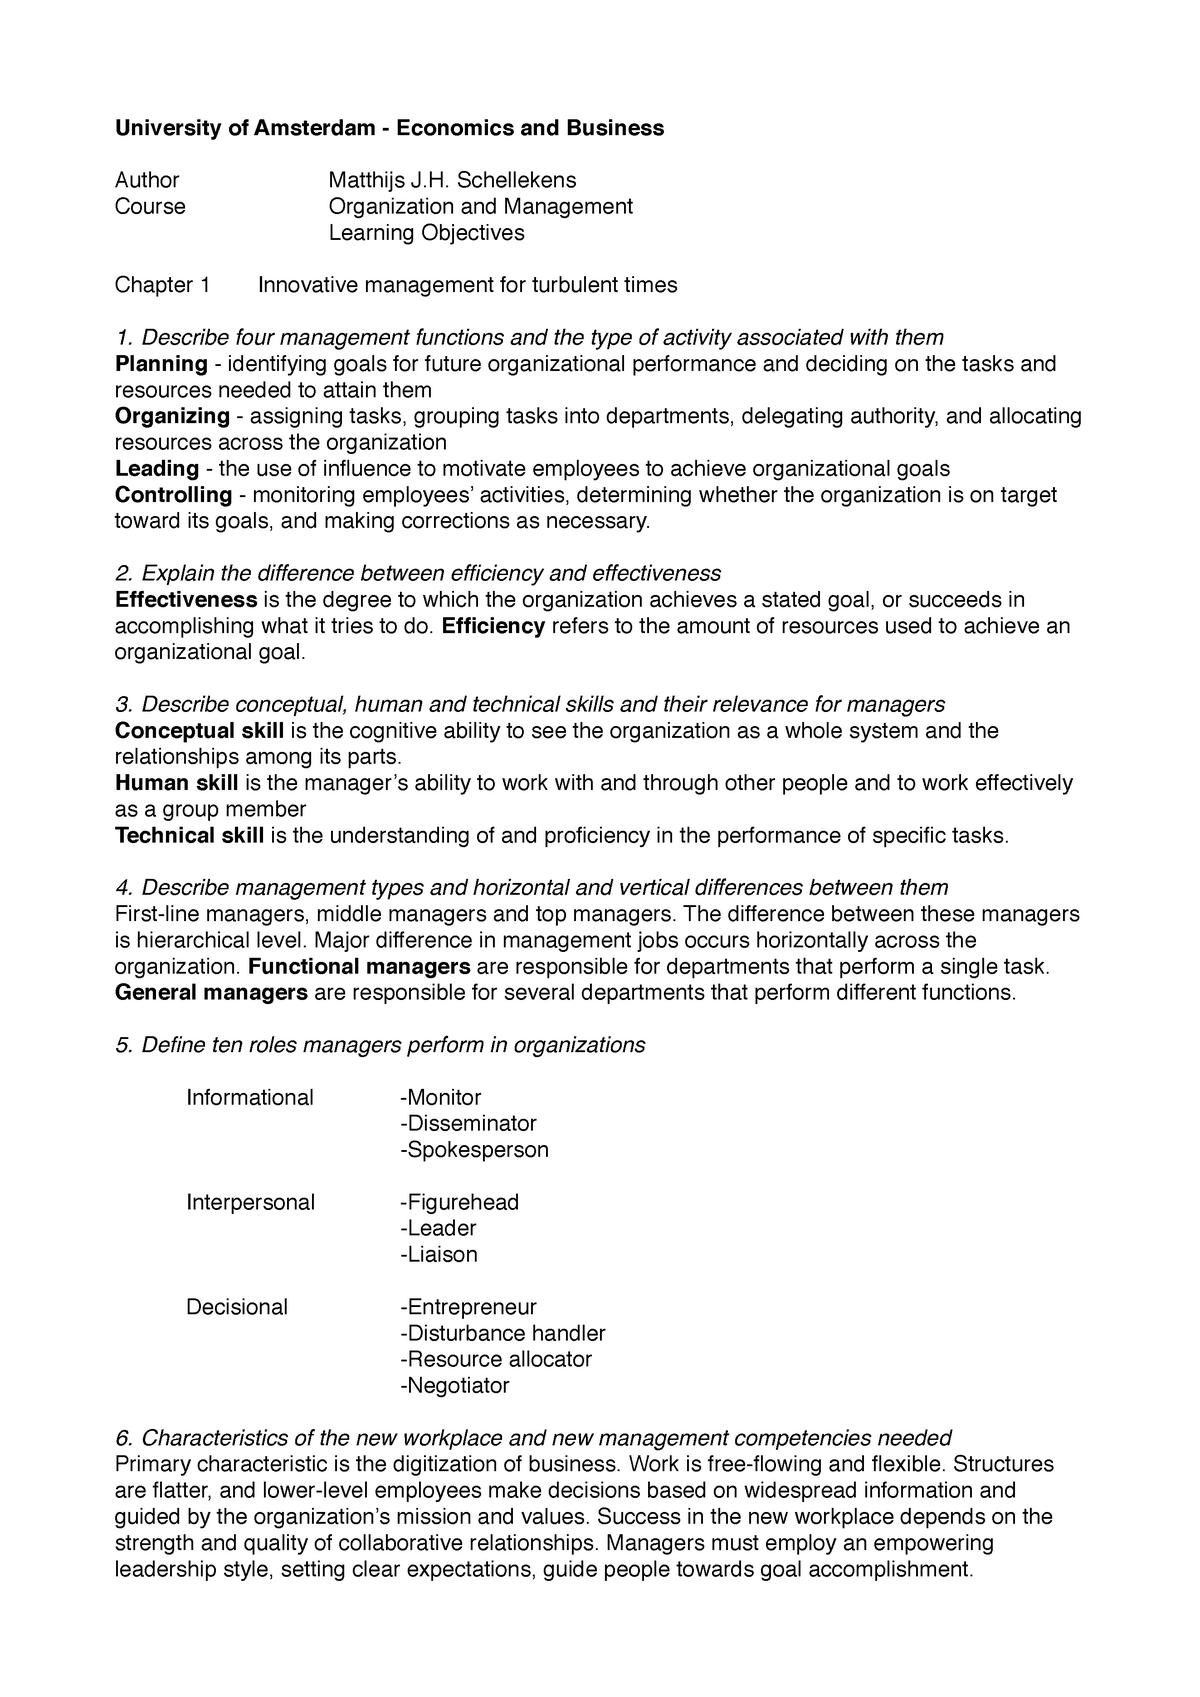 Summary Final Exam Organization and Management - 6011P0128Y